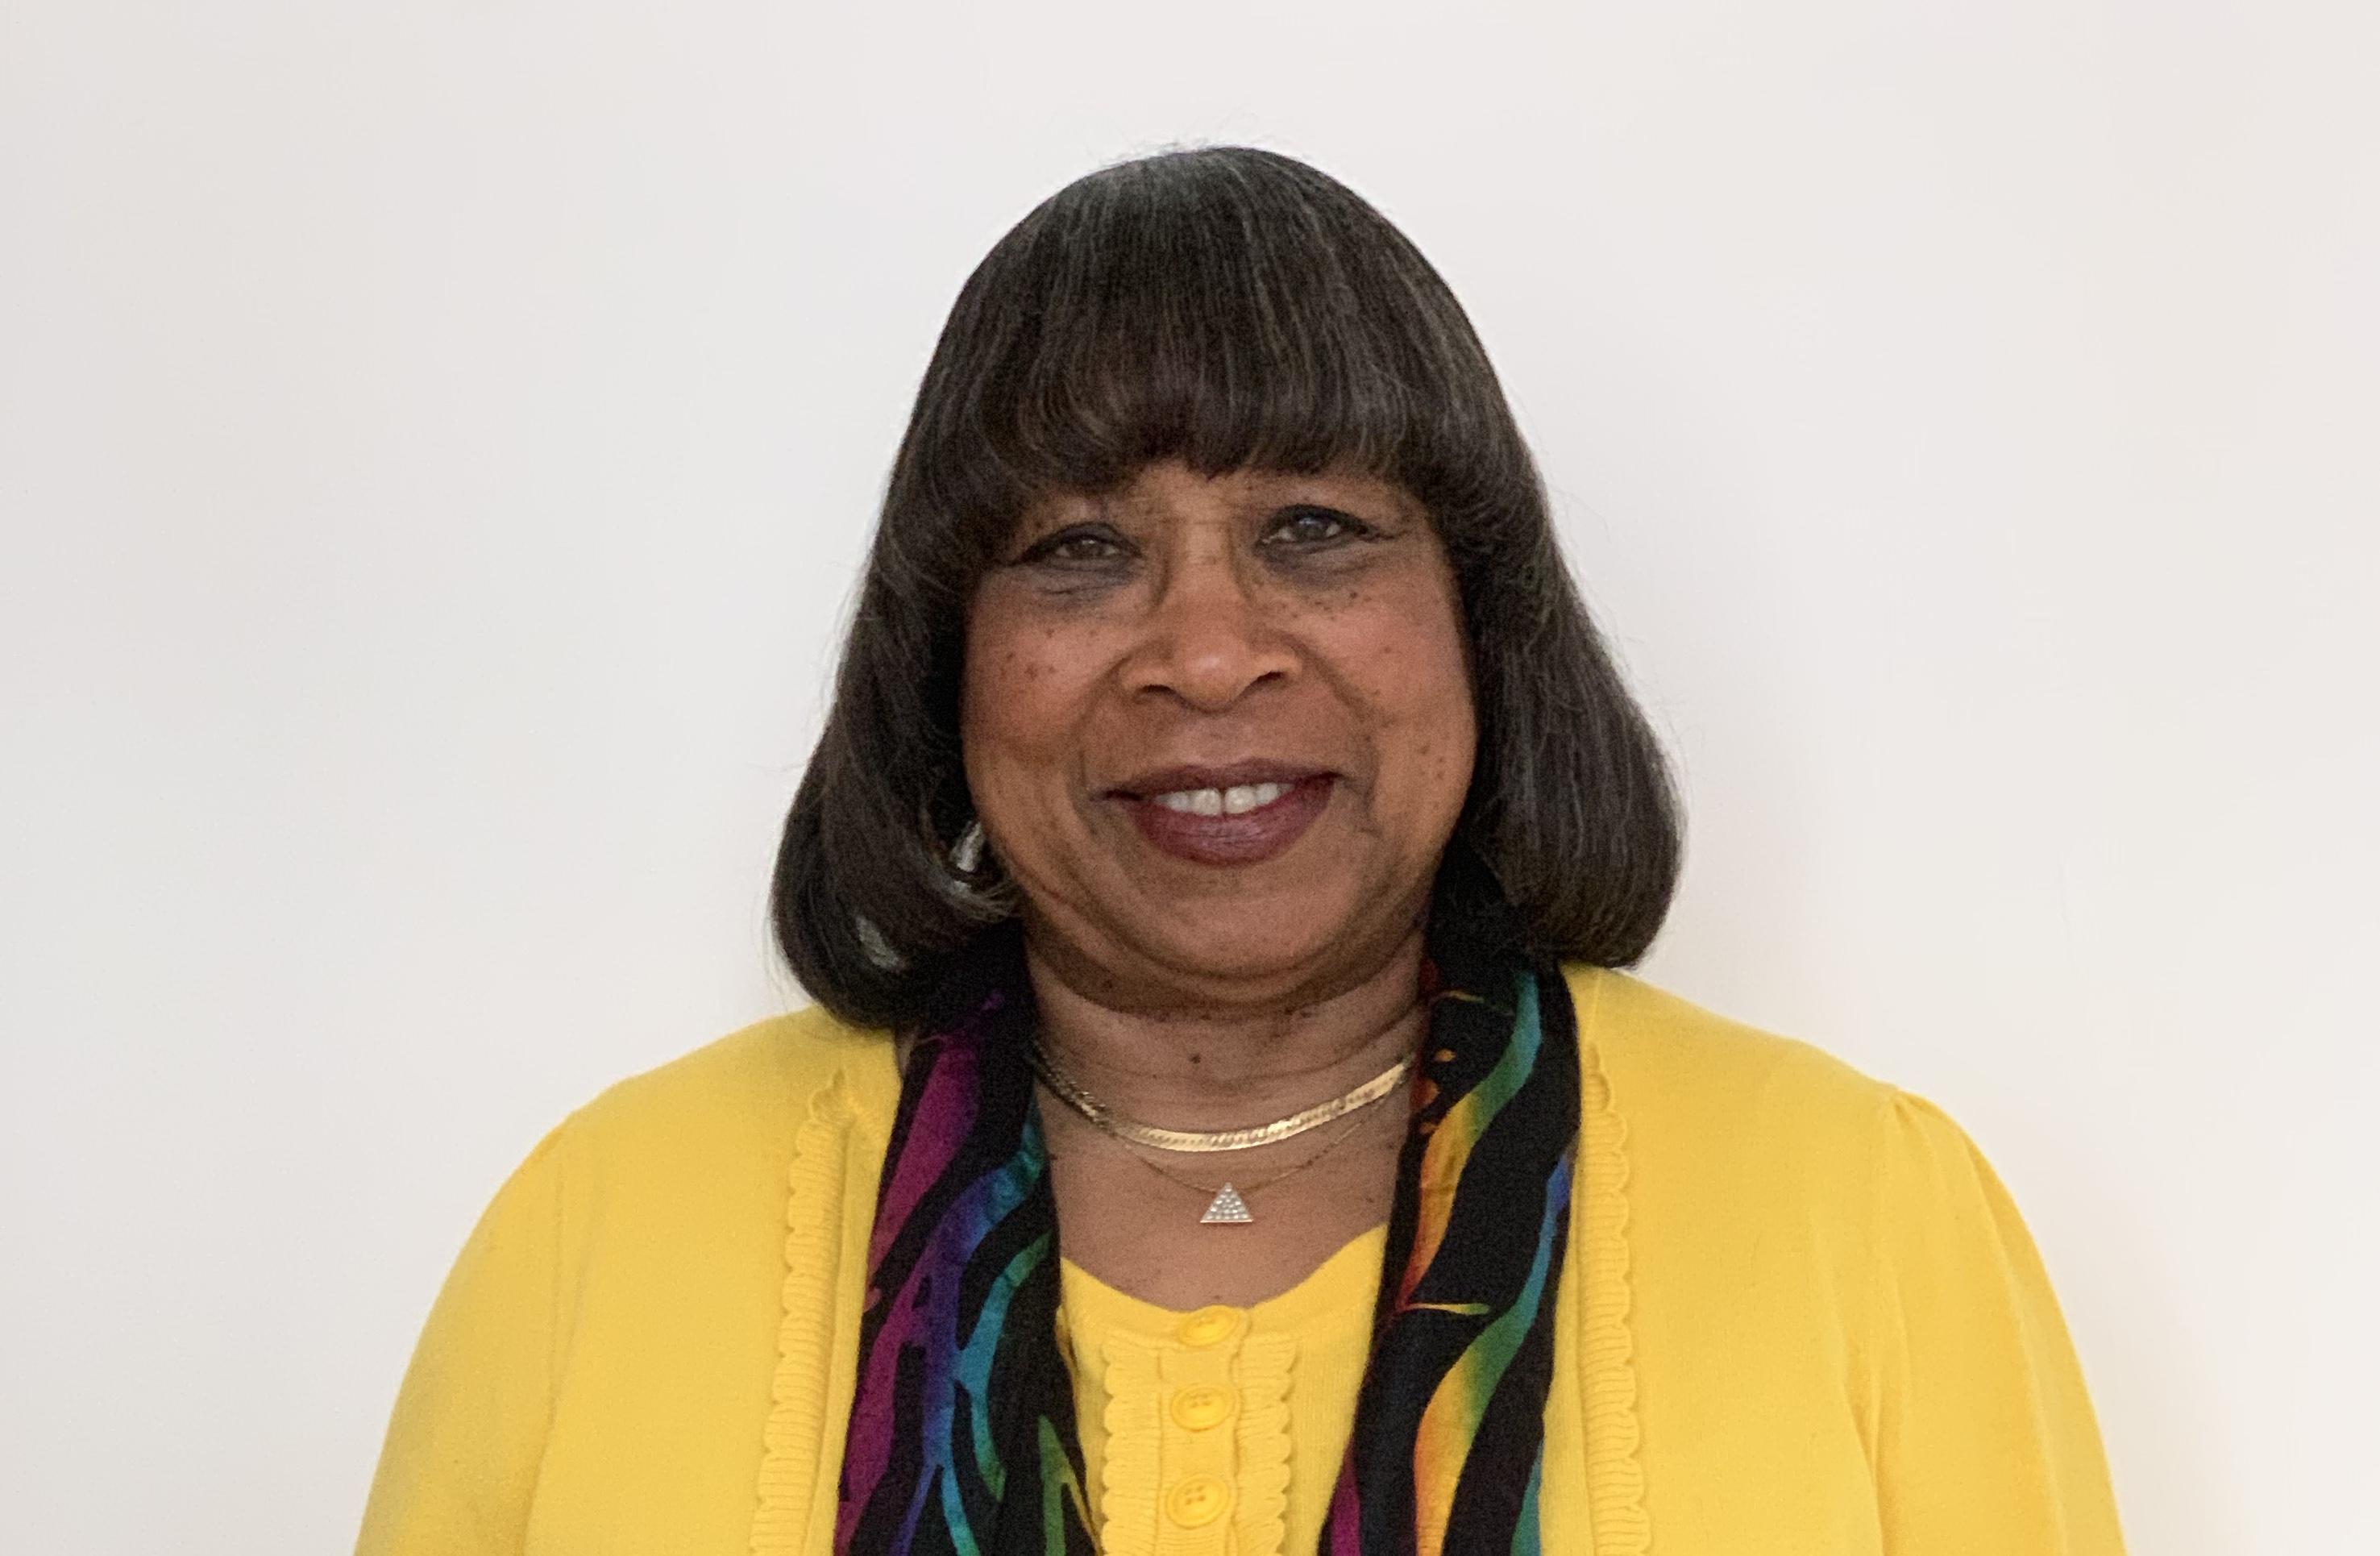 Patricia Ackerman